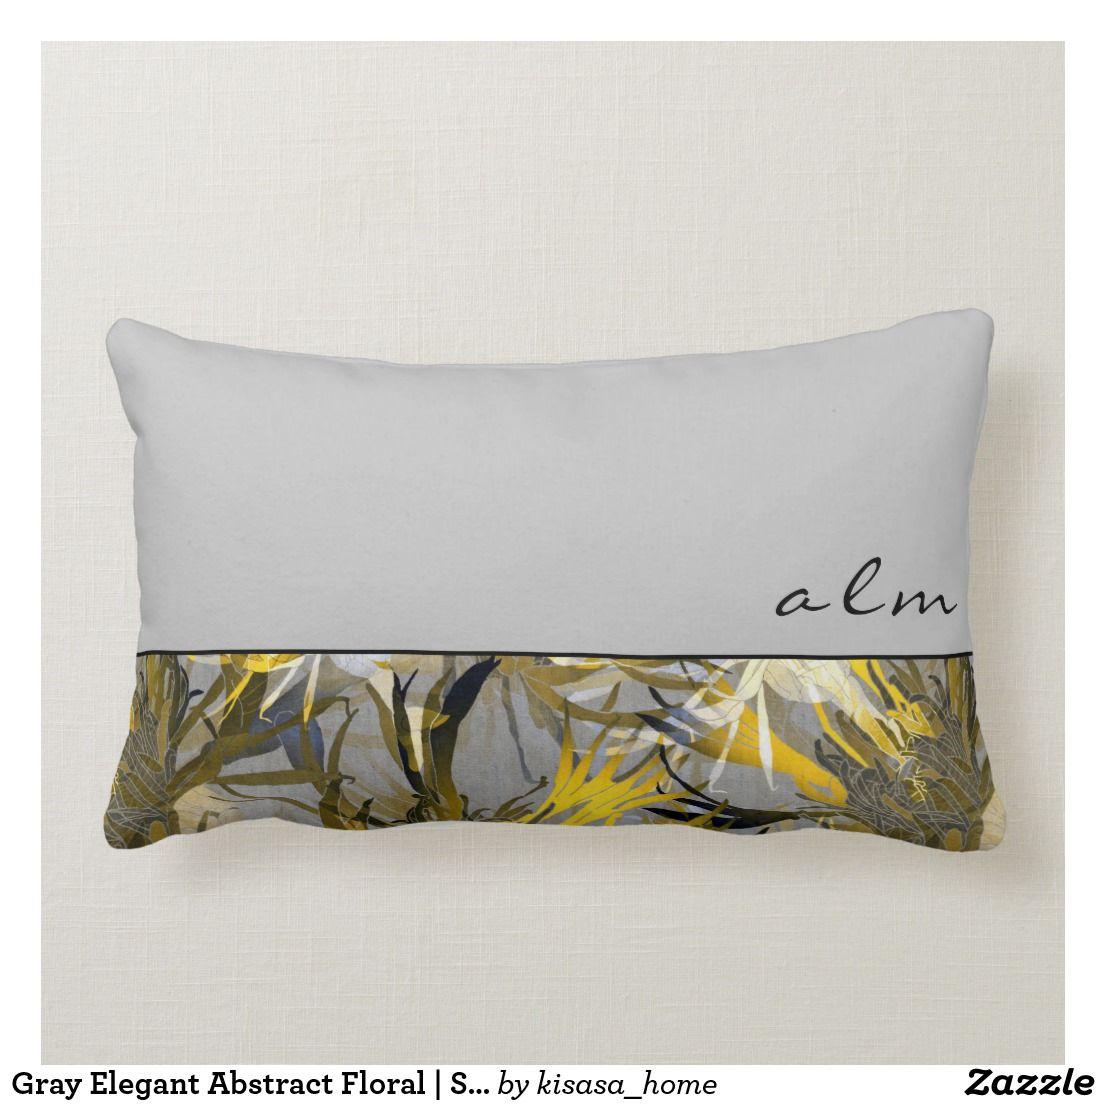 Gray Elegant Abstract Floral Script Monogram Lumbar Pillow Zazzle Com Abstract Floral Pillows Floral Pillows